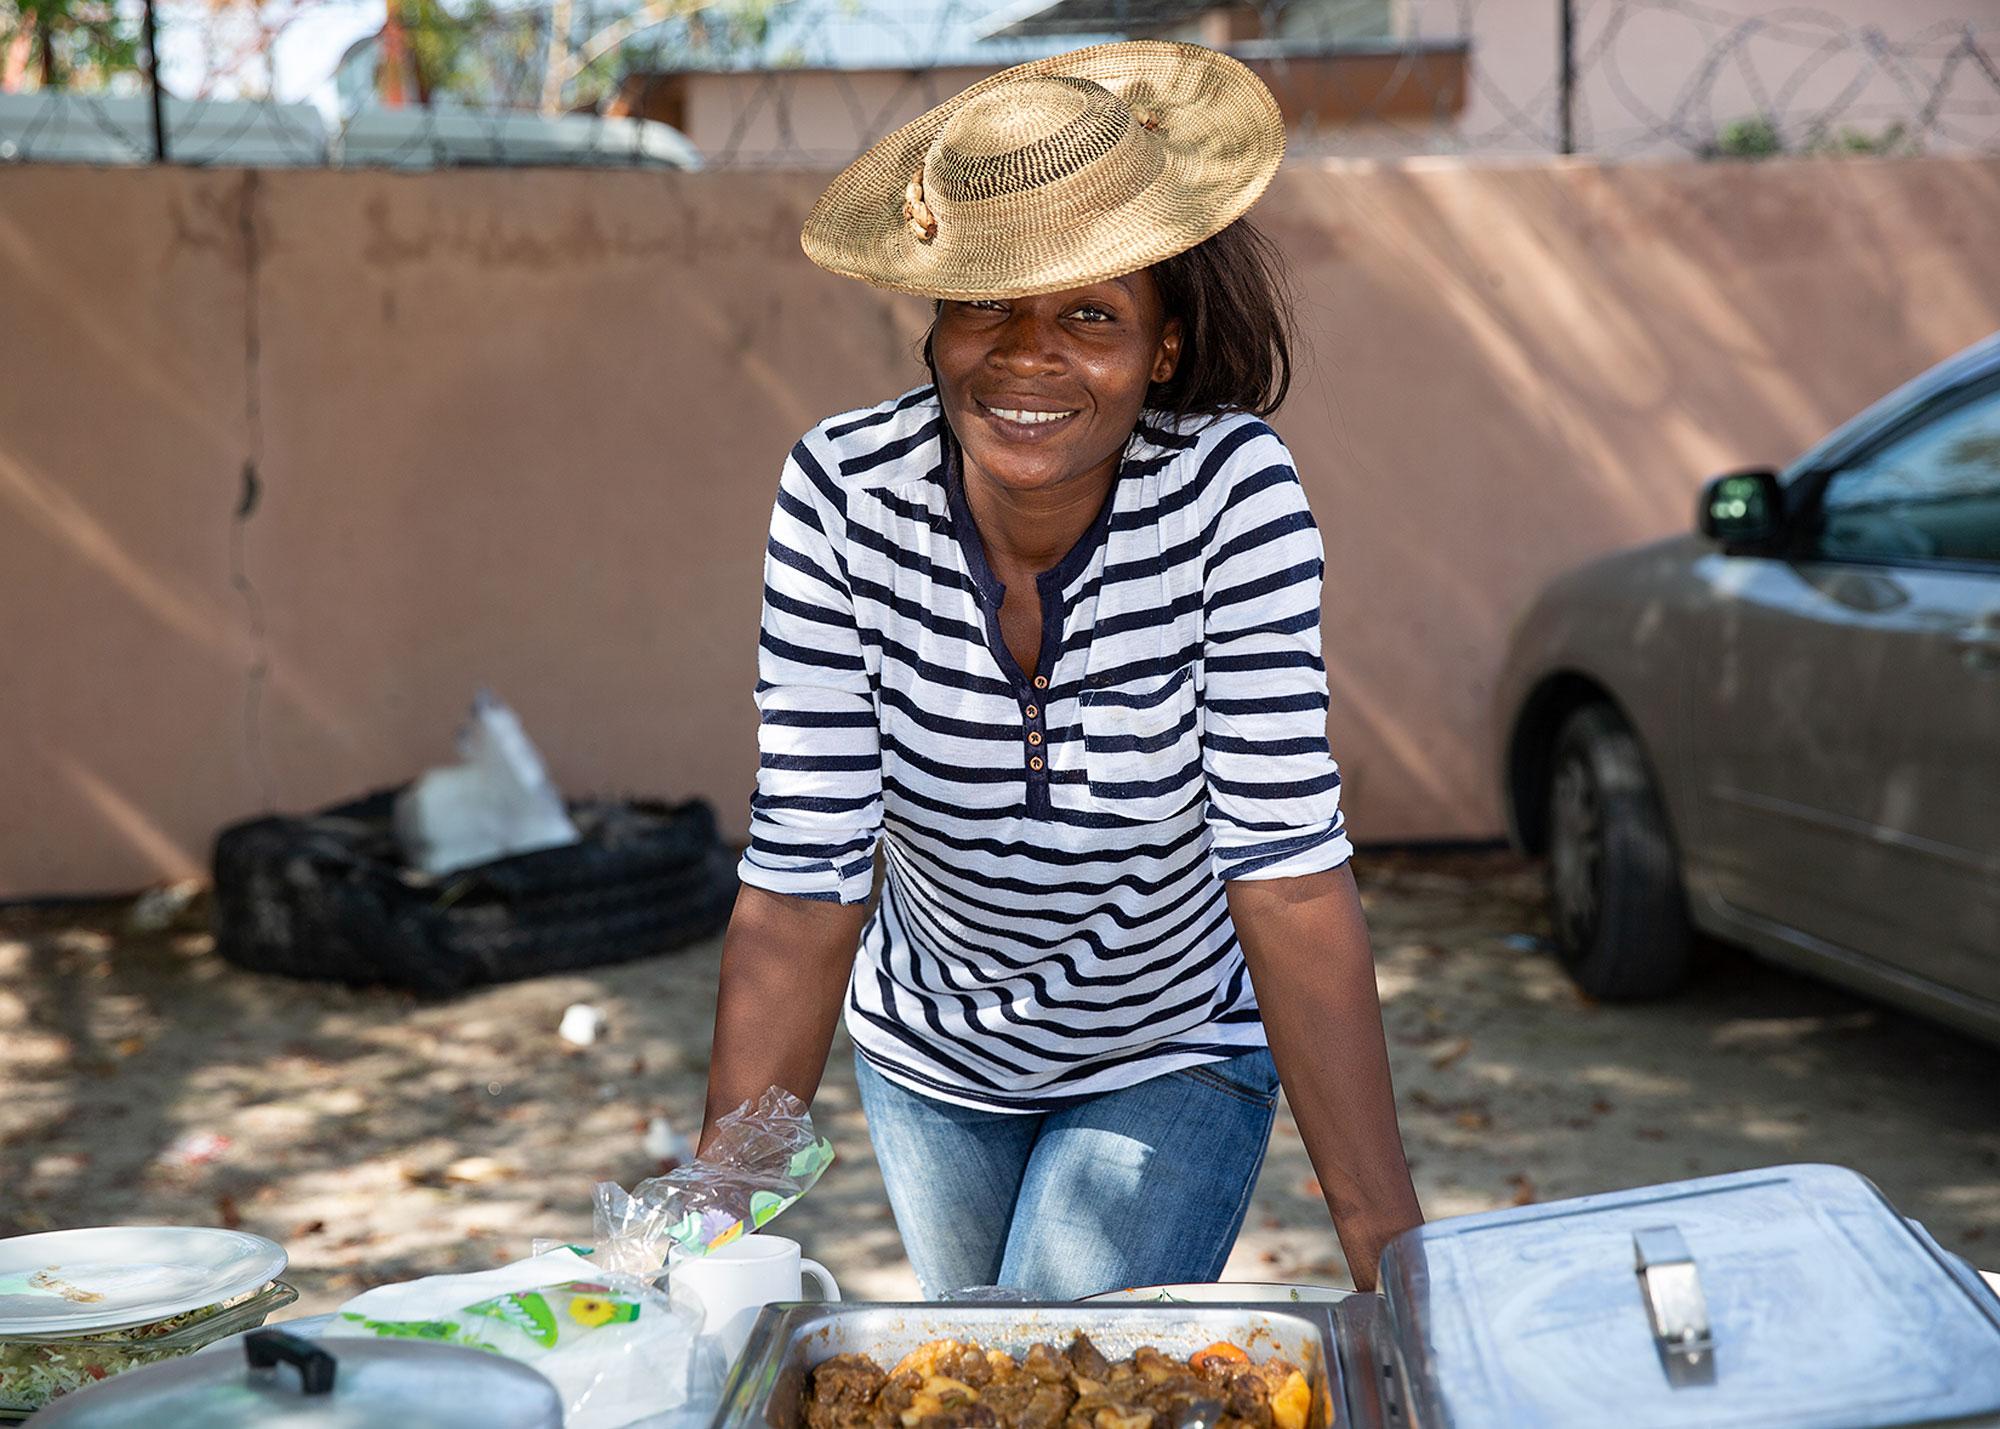 food-vendor-botswana-portrait-5x7